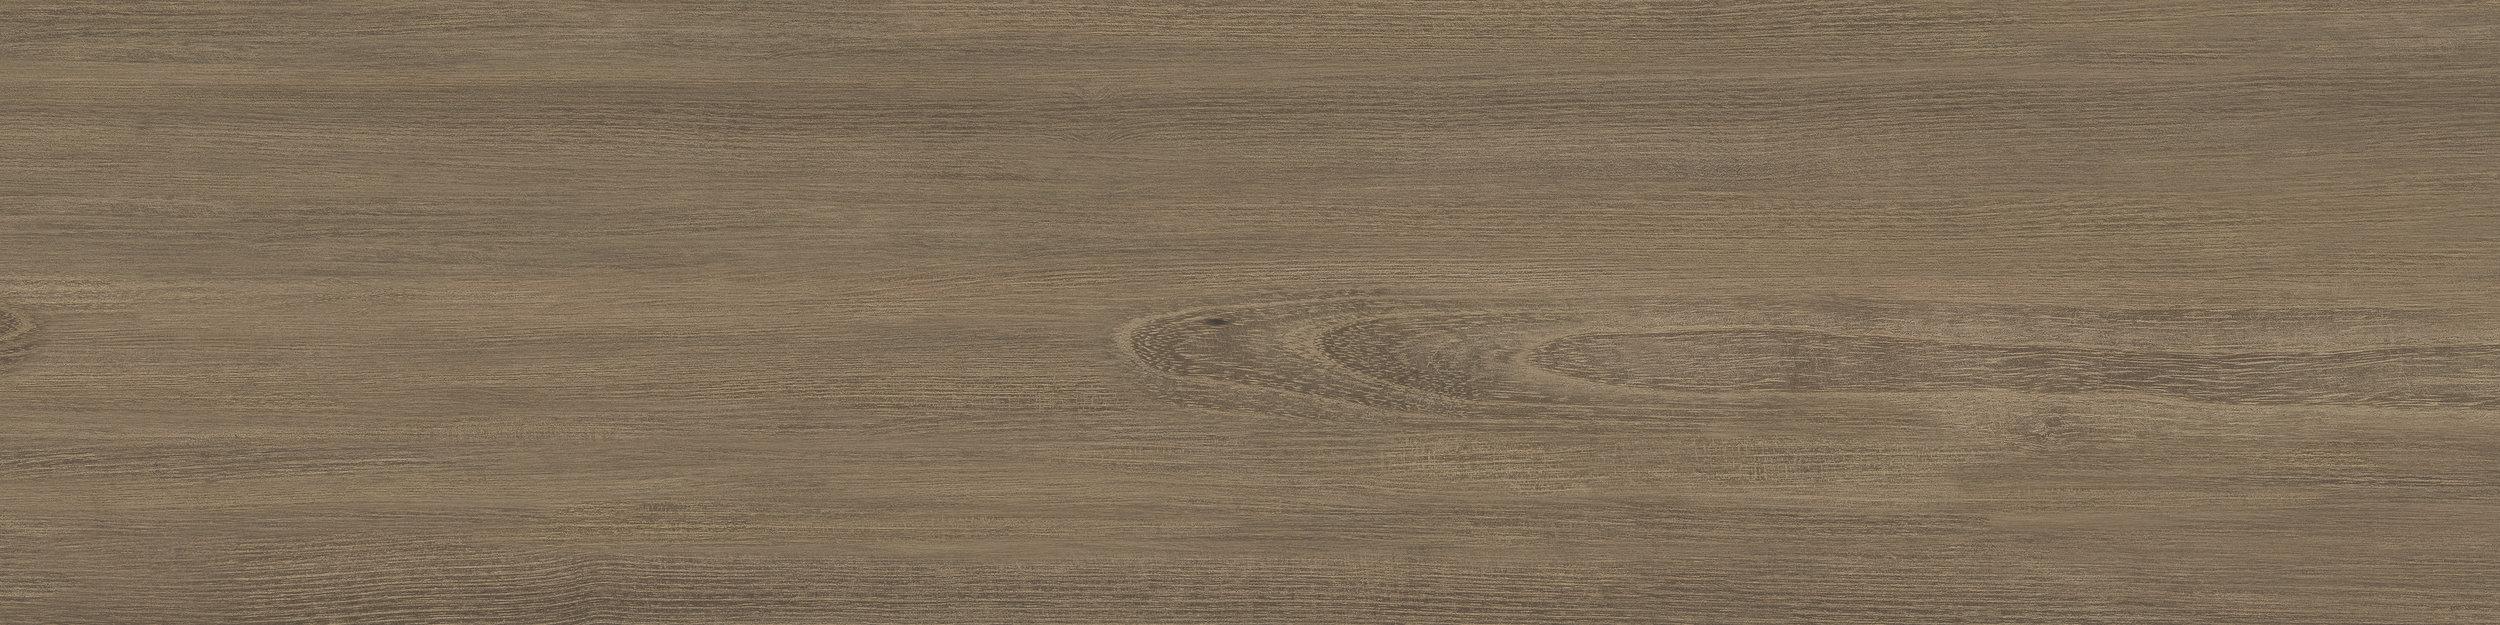 Luxor Fuoco 22.5x90 cm